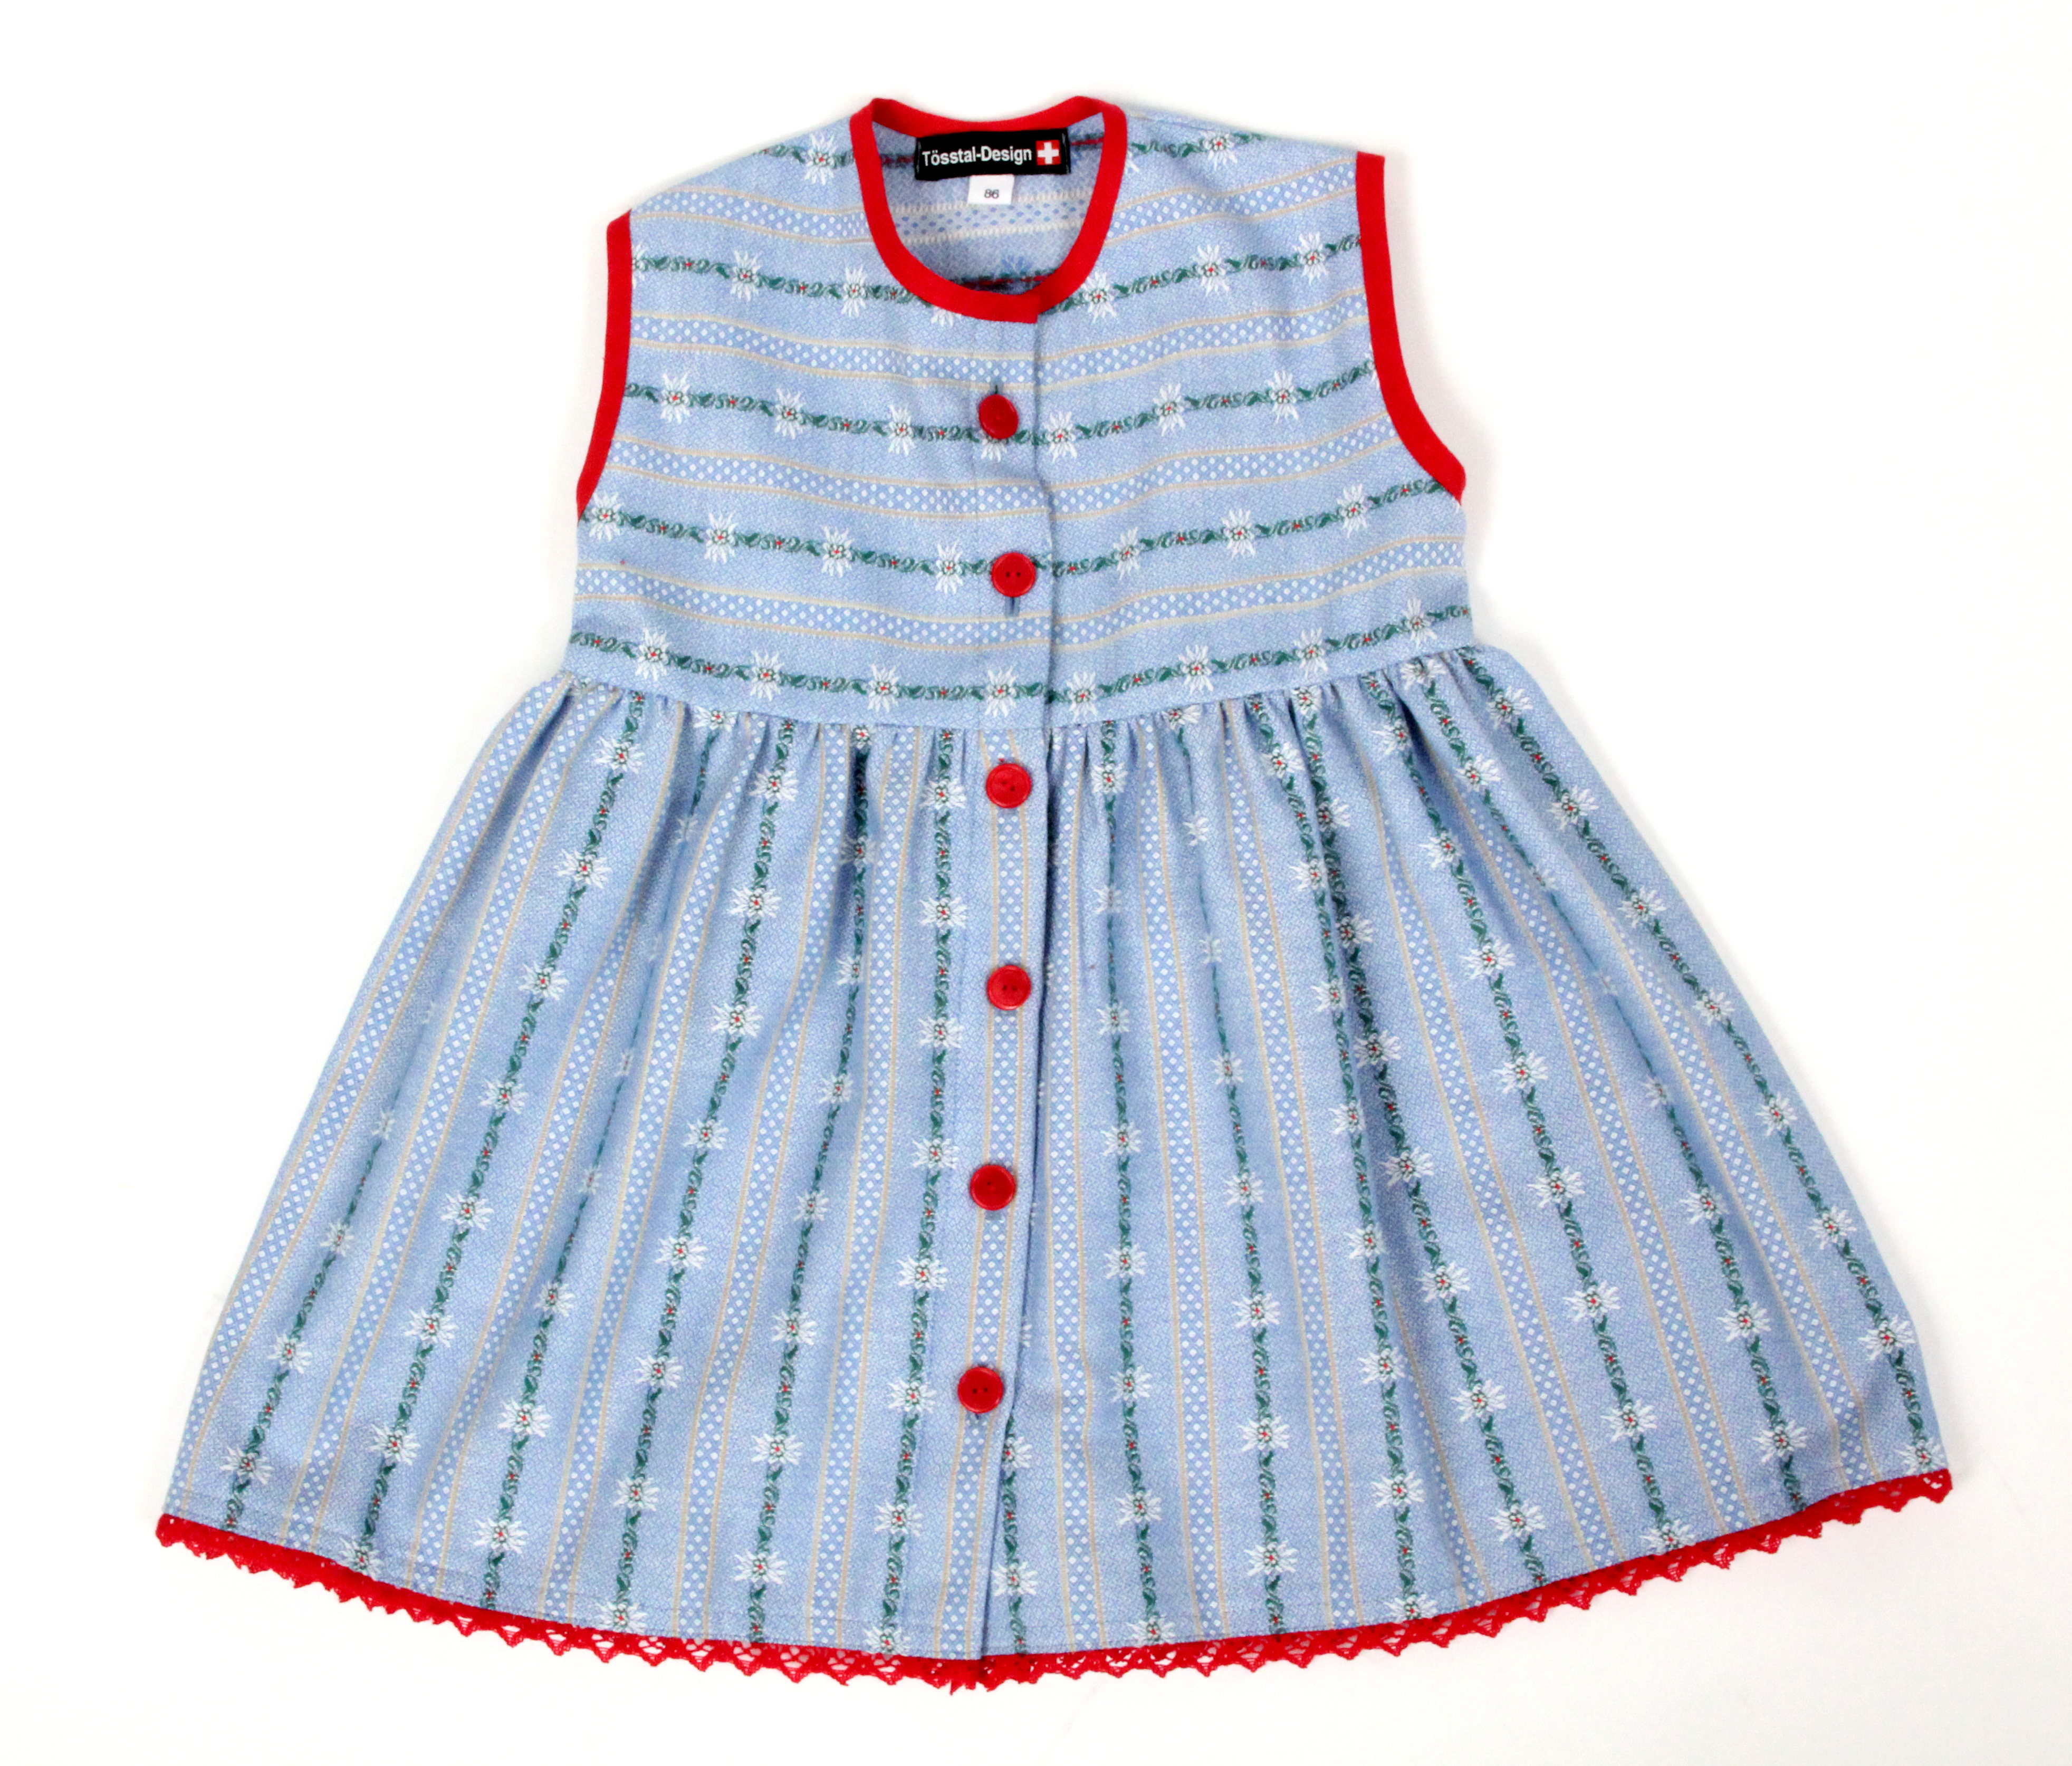 Edelweiss Kinderkleid, hellblau, durchgeknöpft